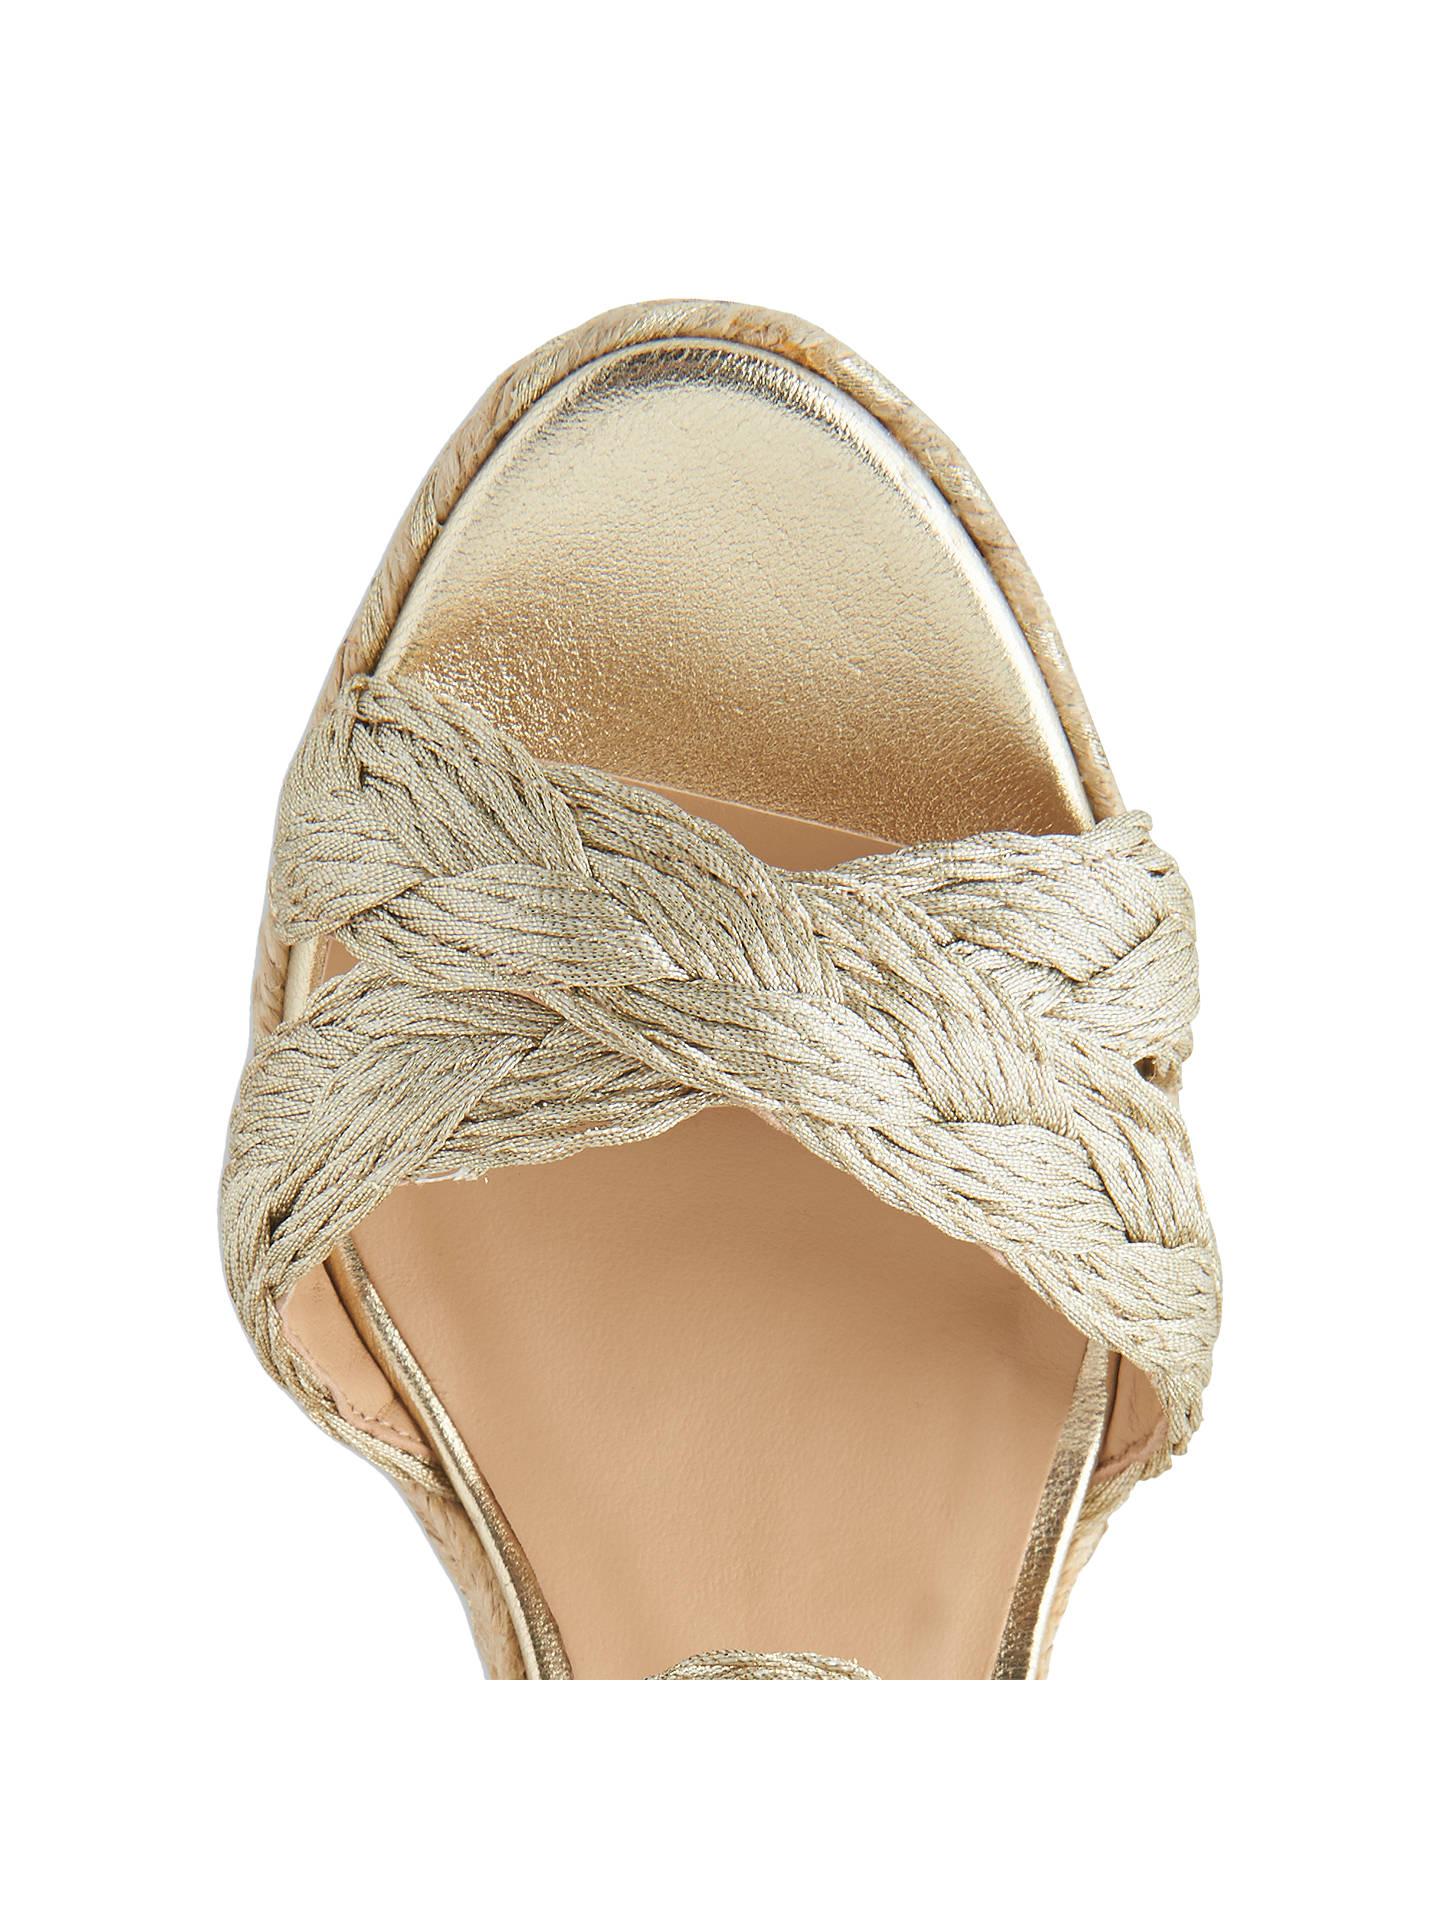 7fa947c1268 L.K.Bennett Roxie Wedge Heel Espadrille Sandals at John Lewis & Partners